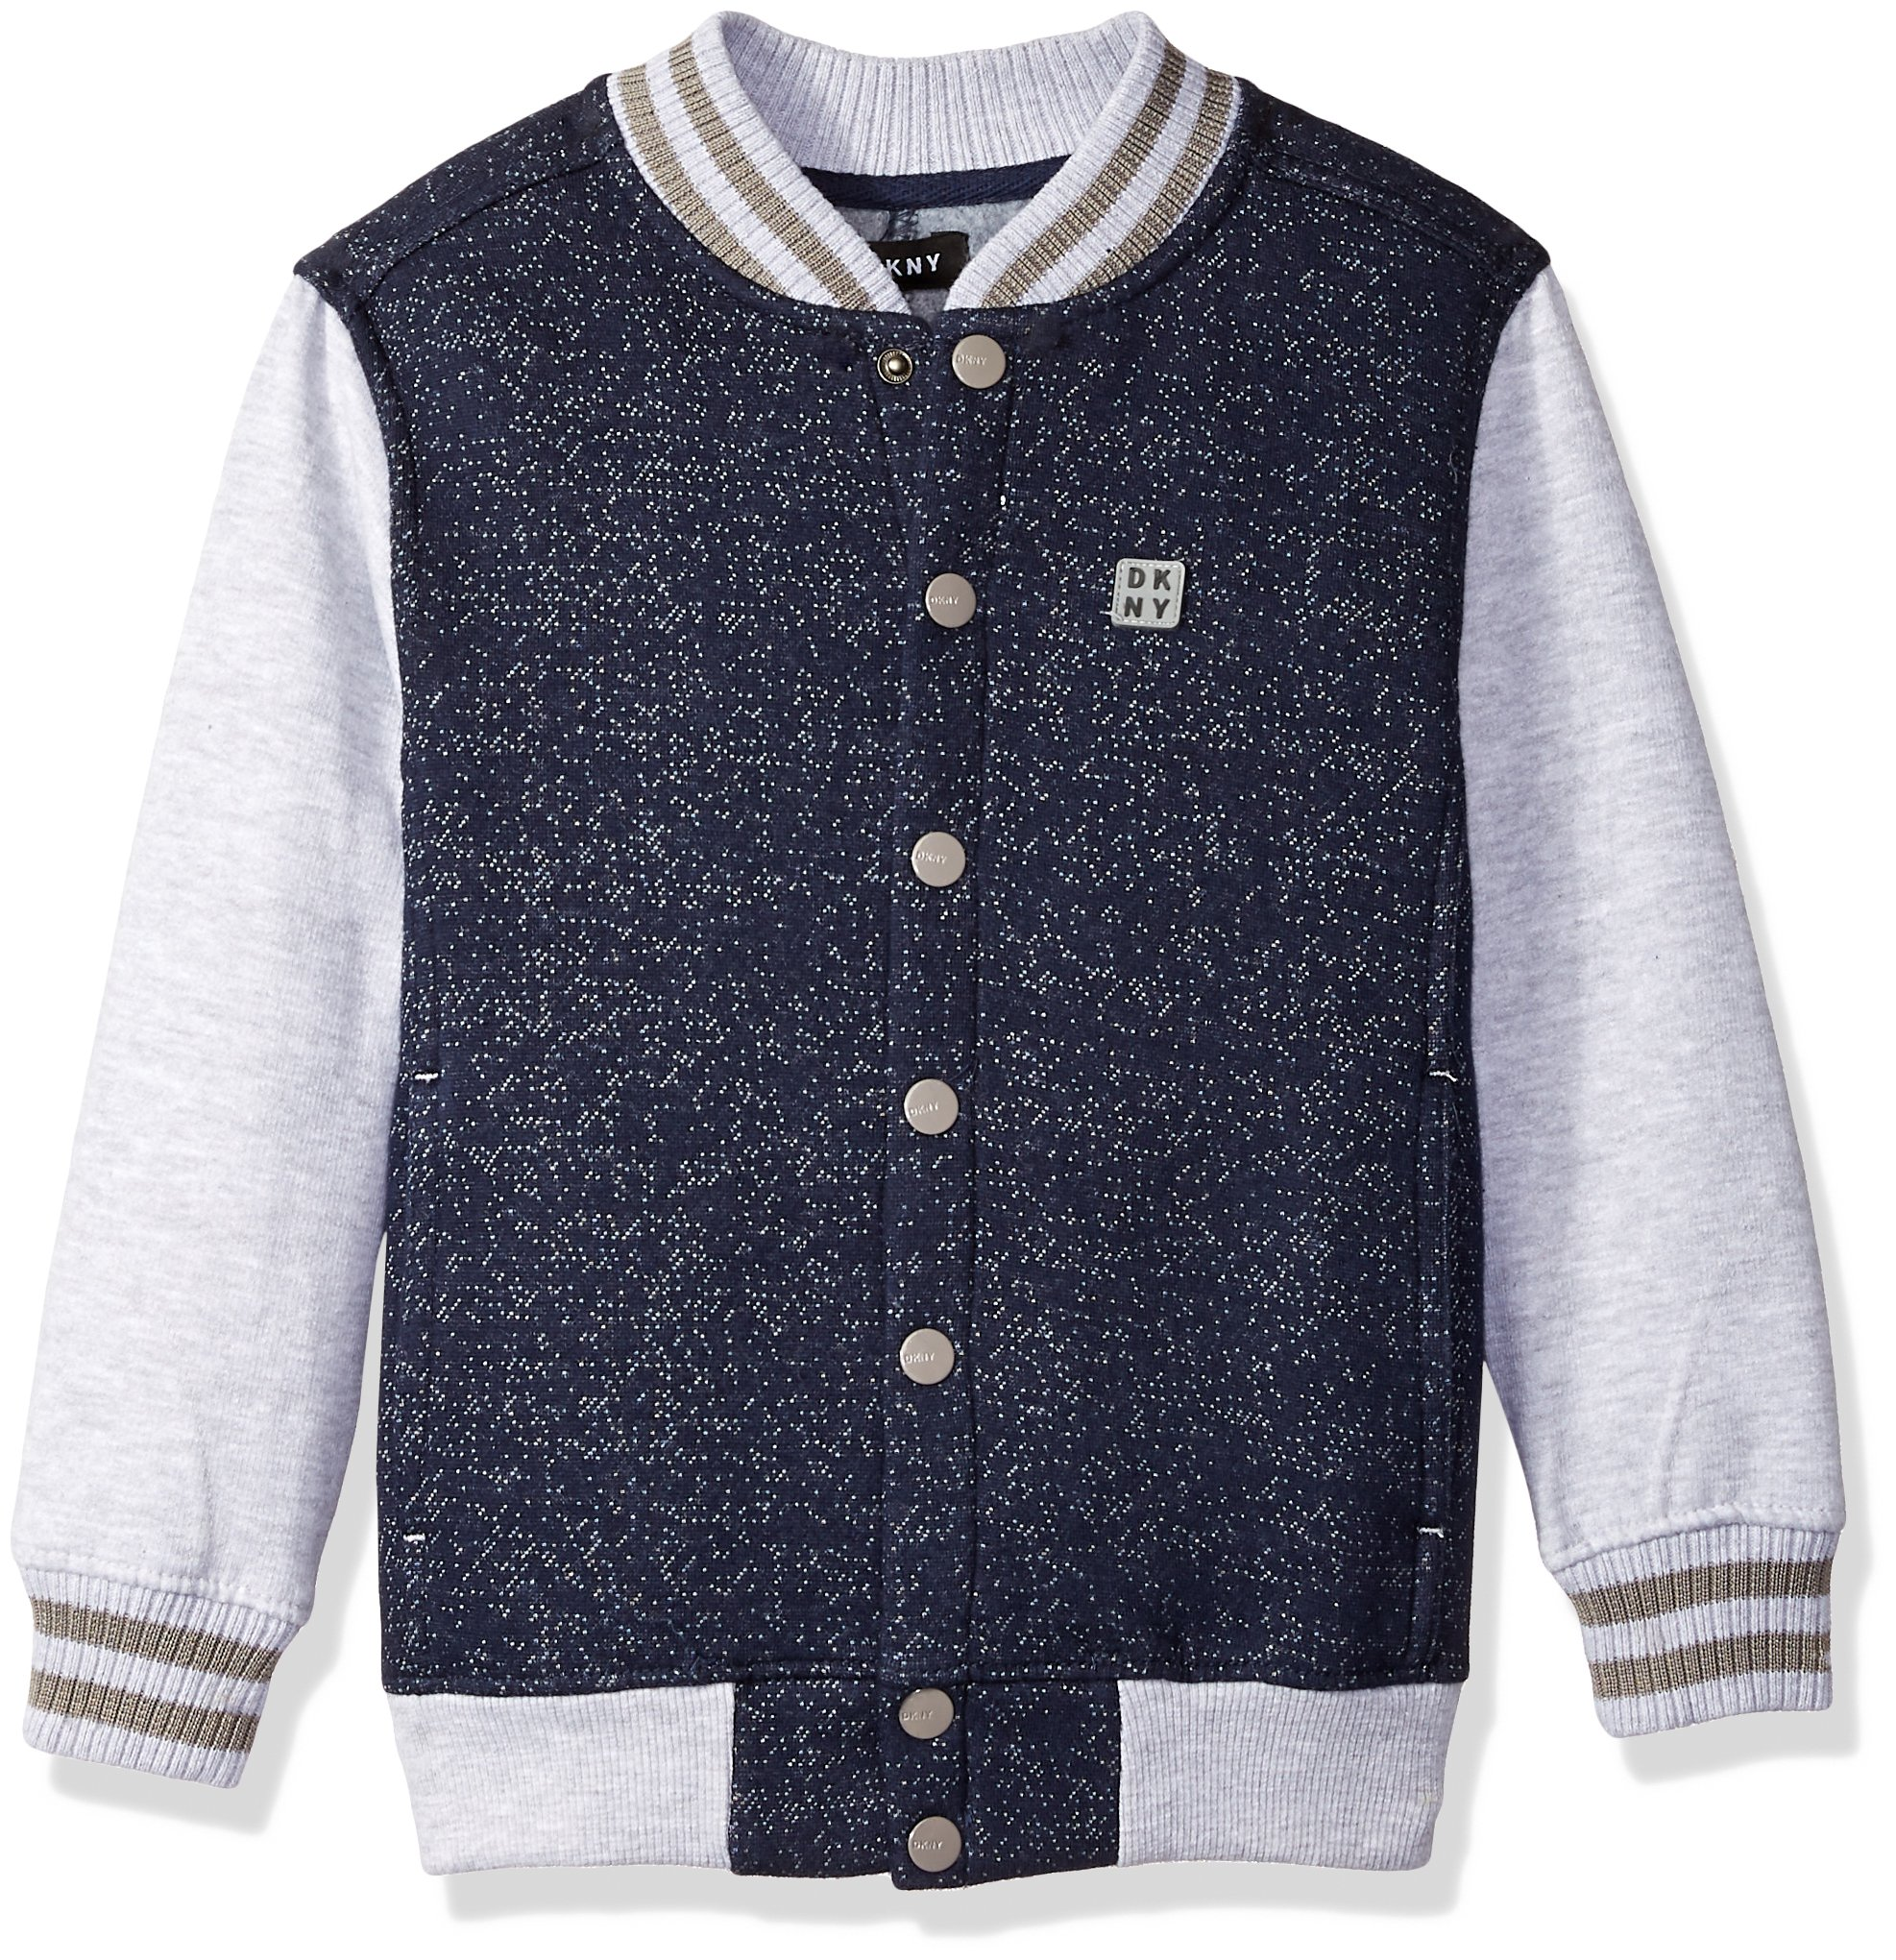 DKNY Little Boys' Snap Front Color Block Grindle Fleece Varsity Style Jacket, Peacoat Grindle, 7